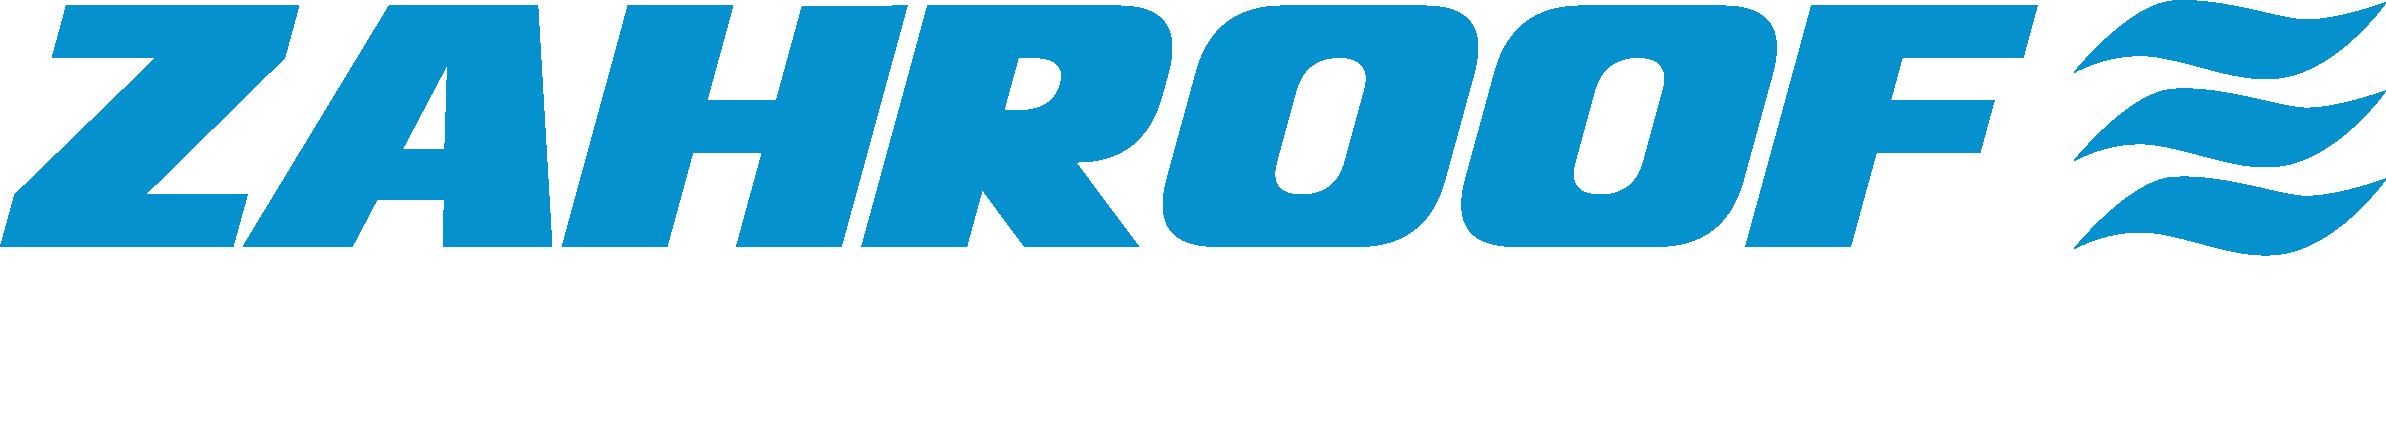 Zaharoof Logo